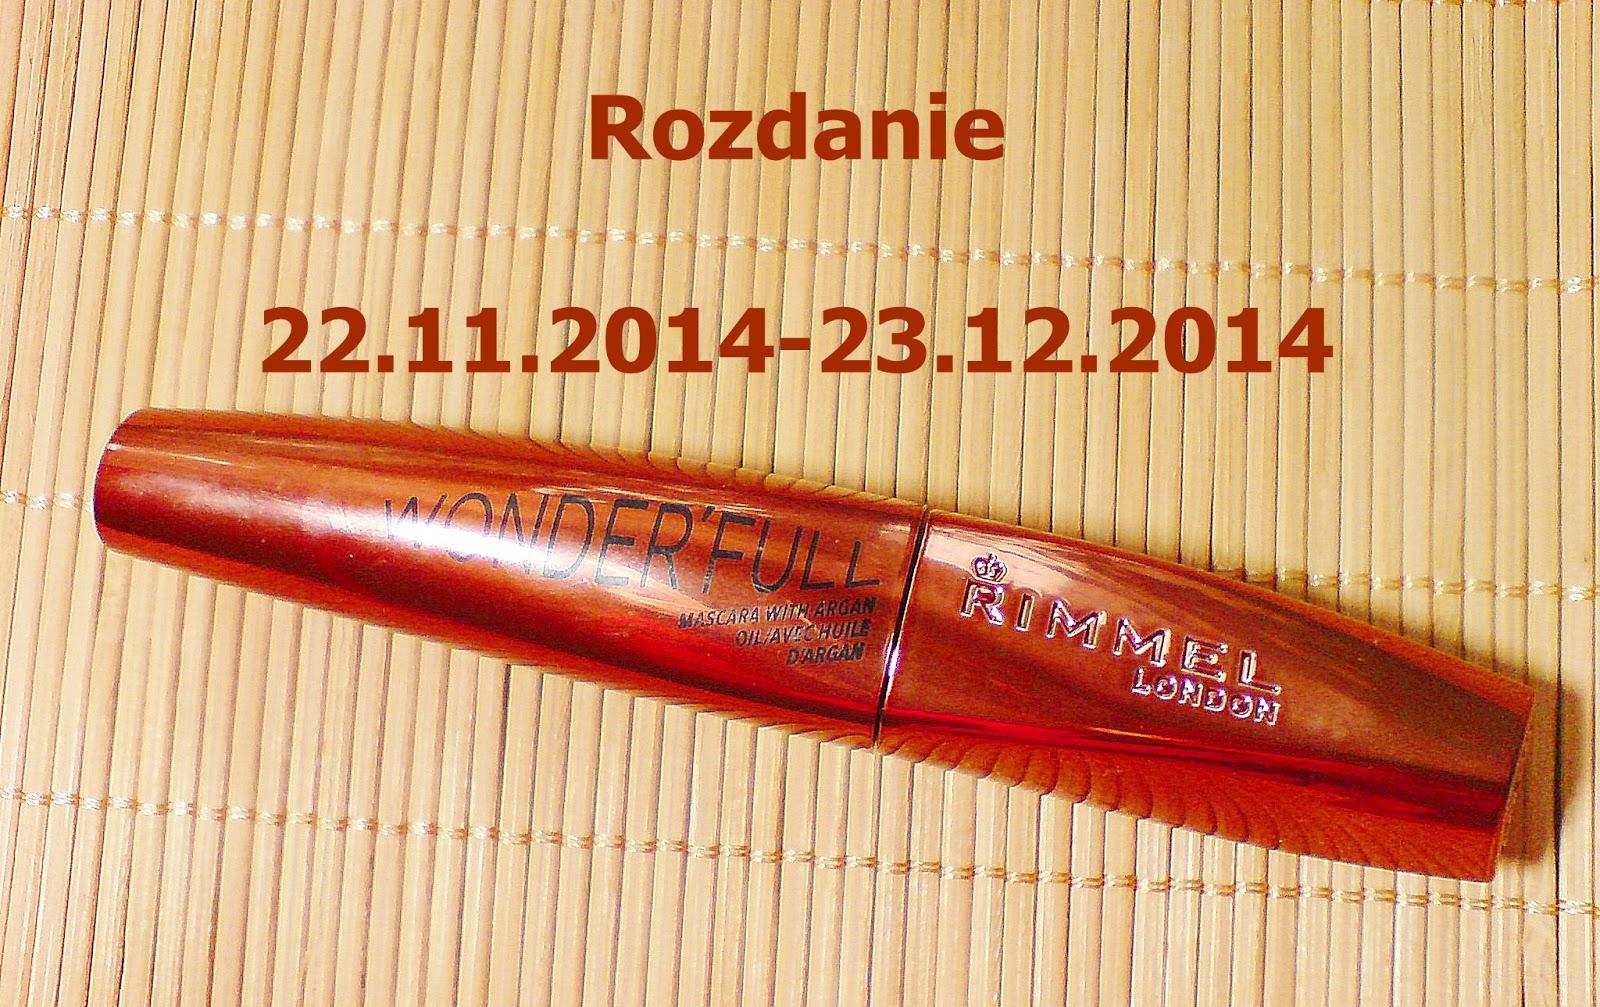 http://truskawkowakawa.blogspot.com/2014/11/rozdanie.html